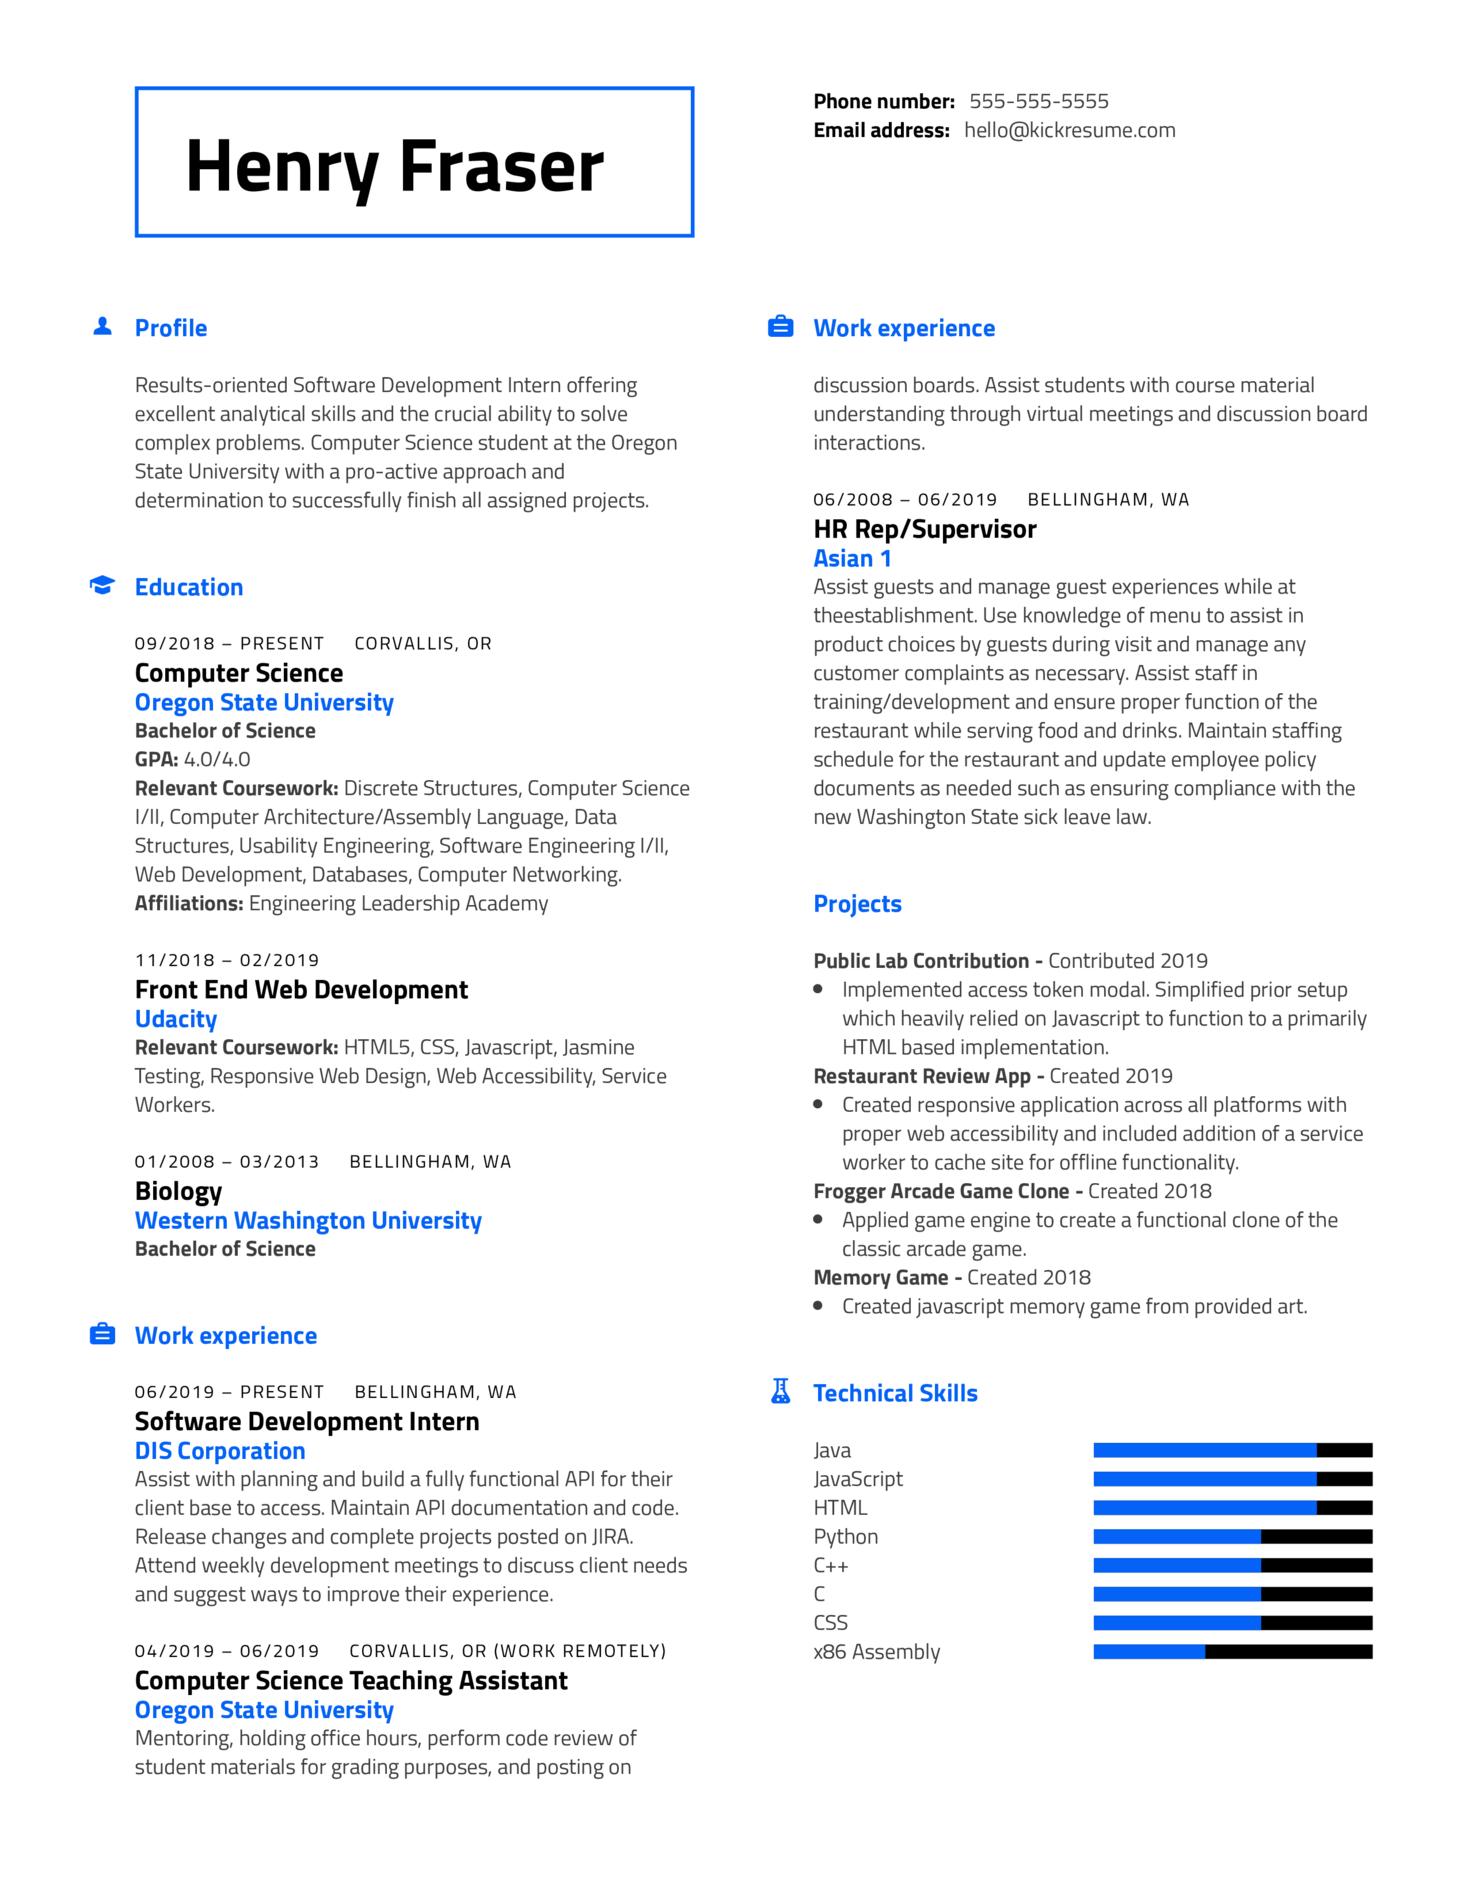 DIS Software Development Intern Resume Example